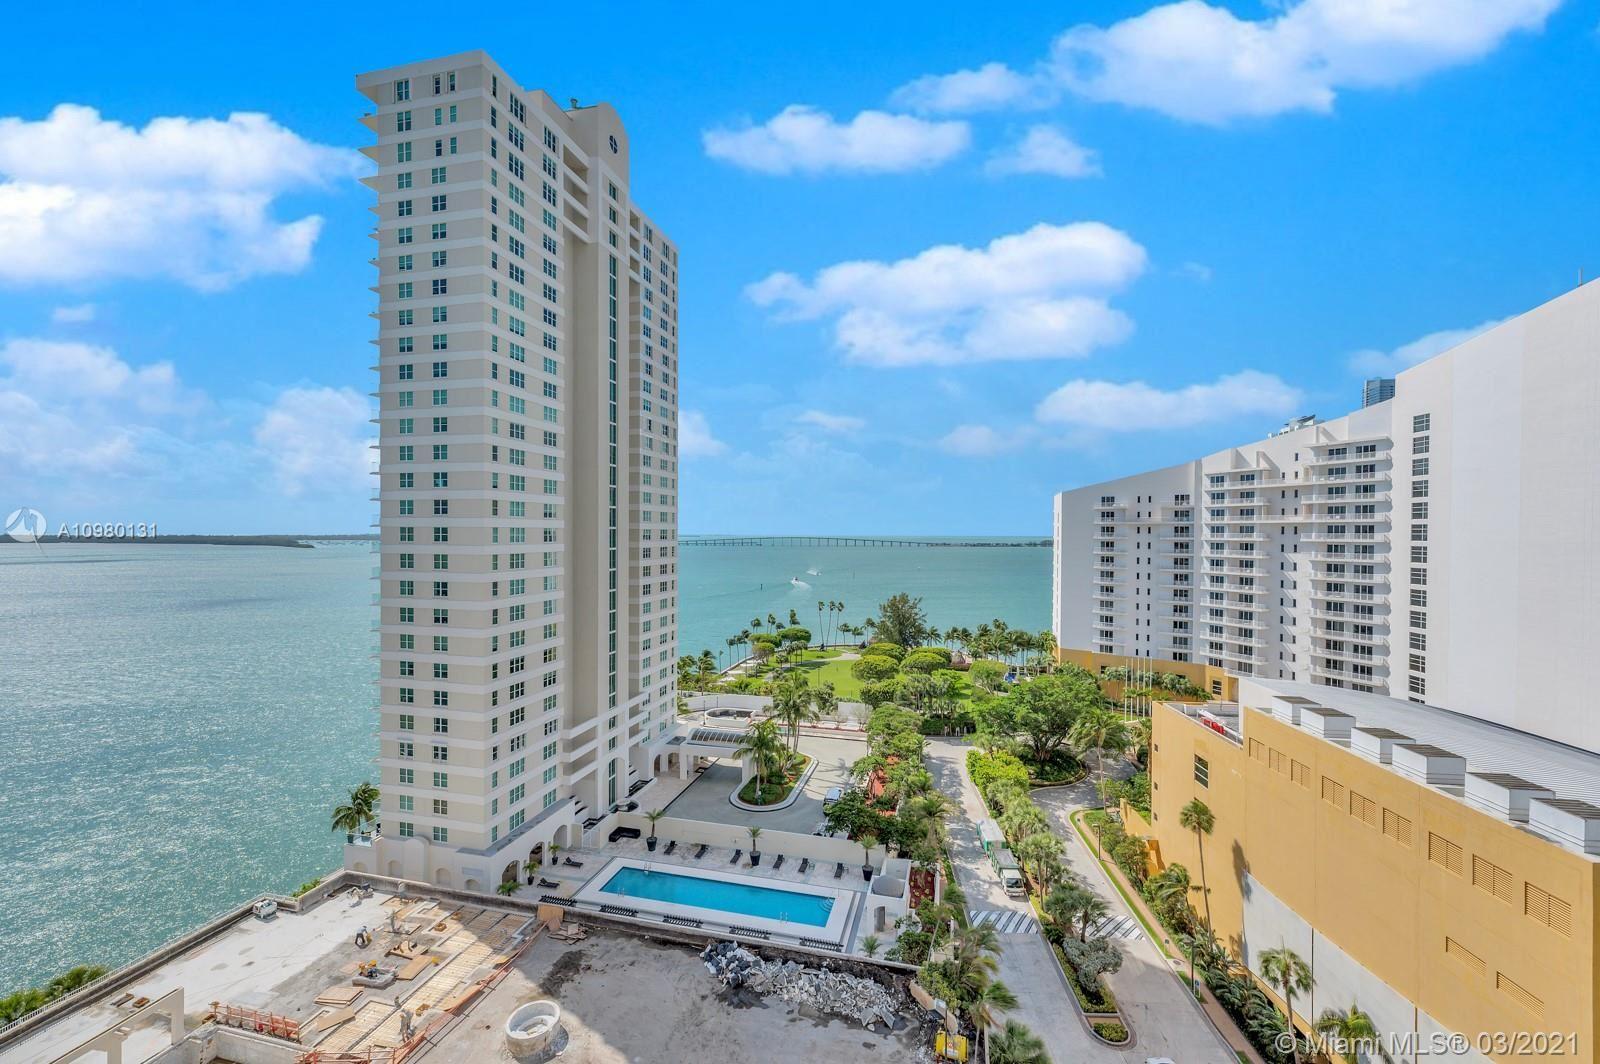 770 Claughton Island Dr #1704, Miami, FL 33131 - #: A10980131